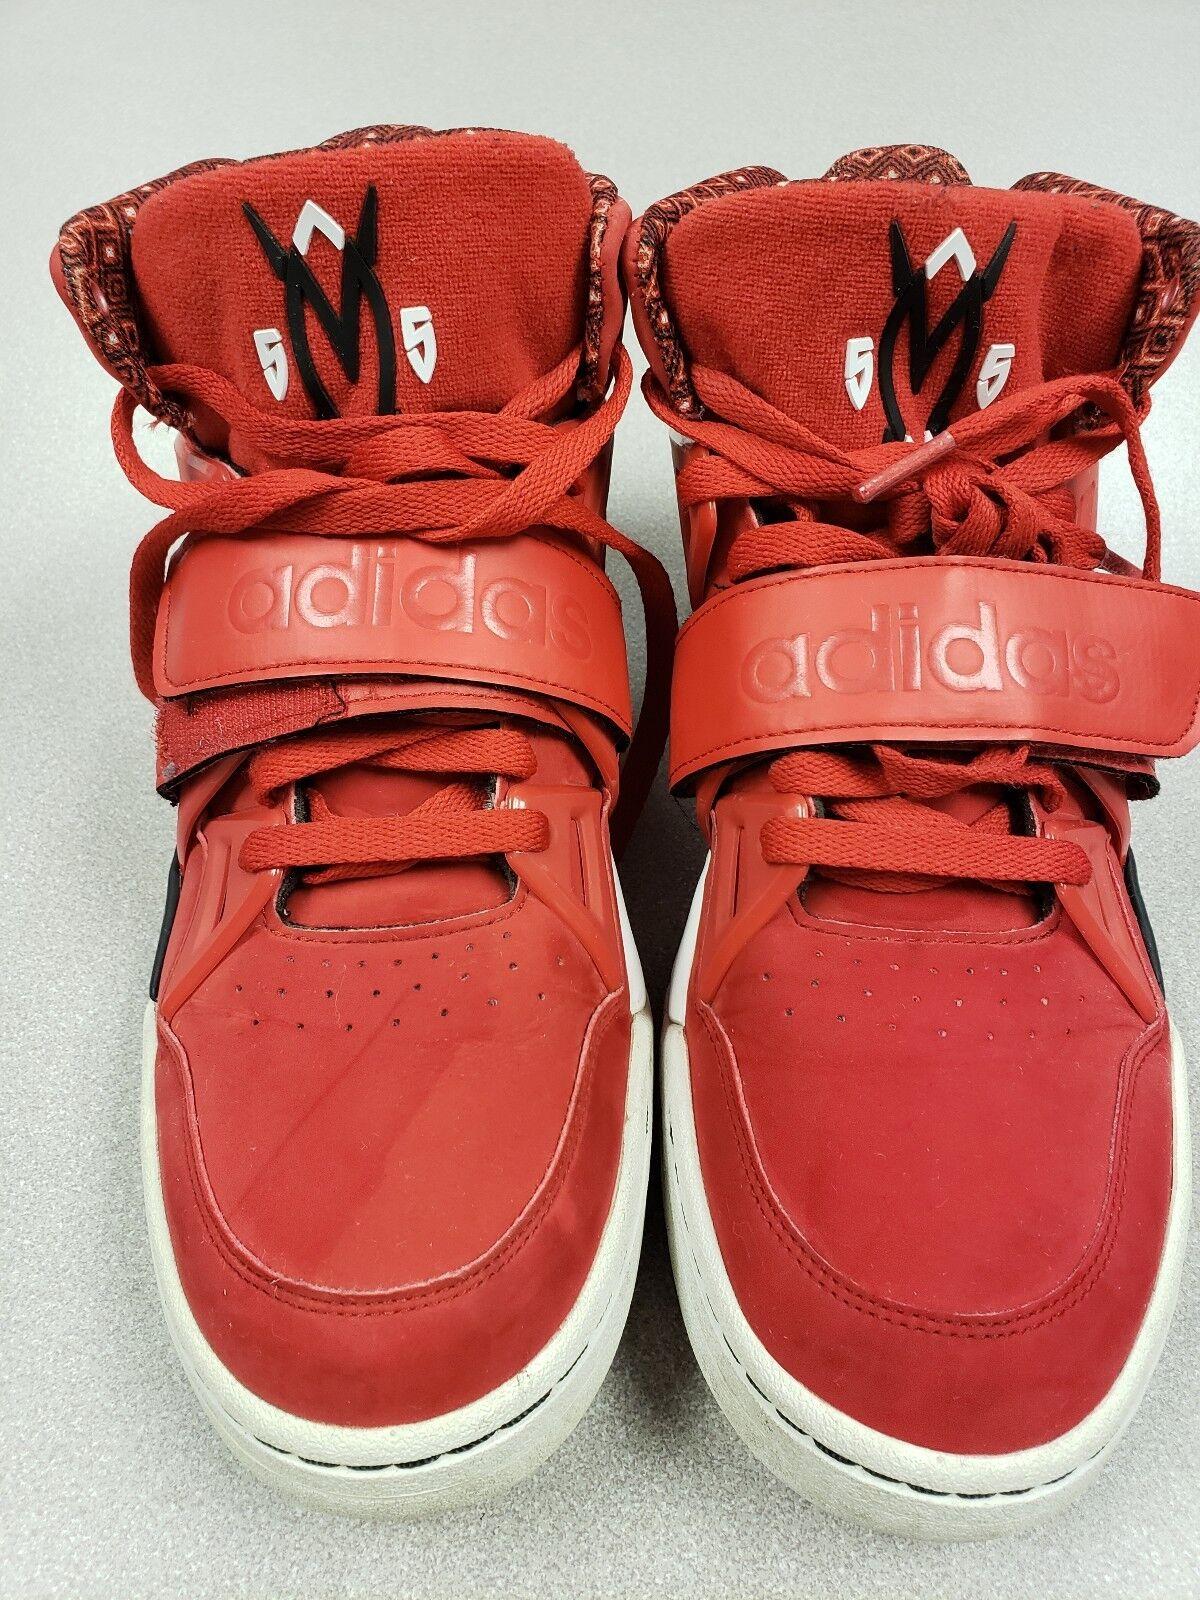 Adidas mutombo 55 basket di nascosto.dimensione 10 | Qualità Eccellente  Eccellente  Eccellente  0306a4